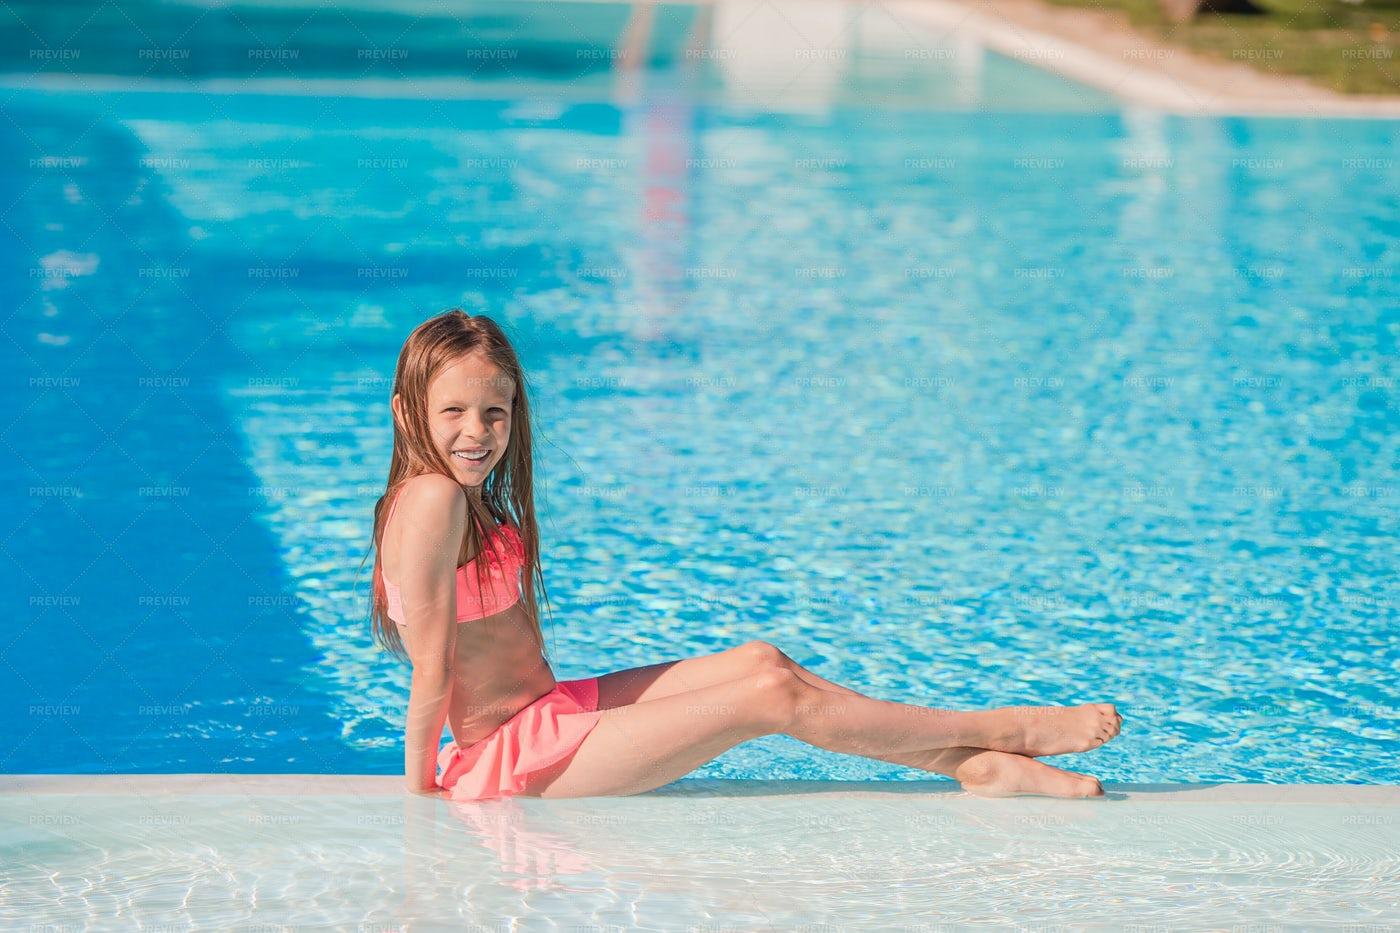 Little Girl Sitting Poolside: Stock Photos